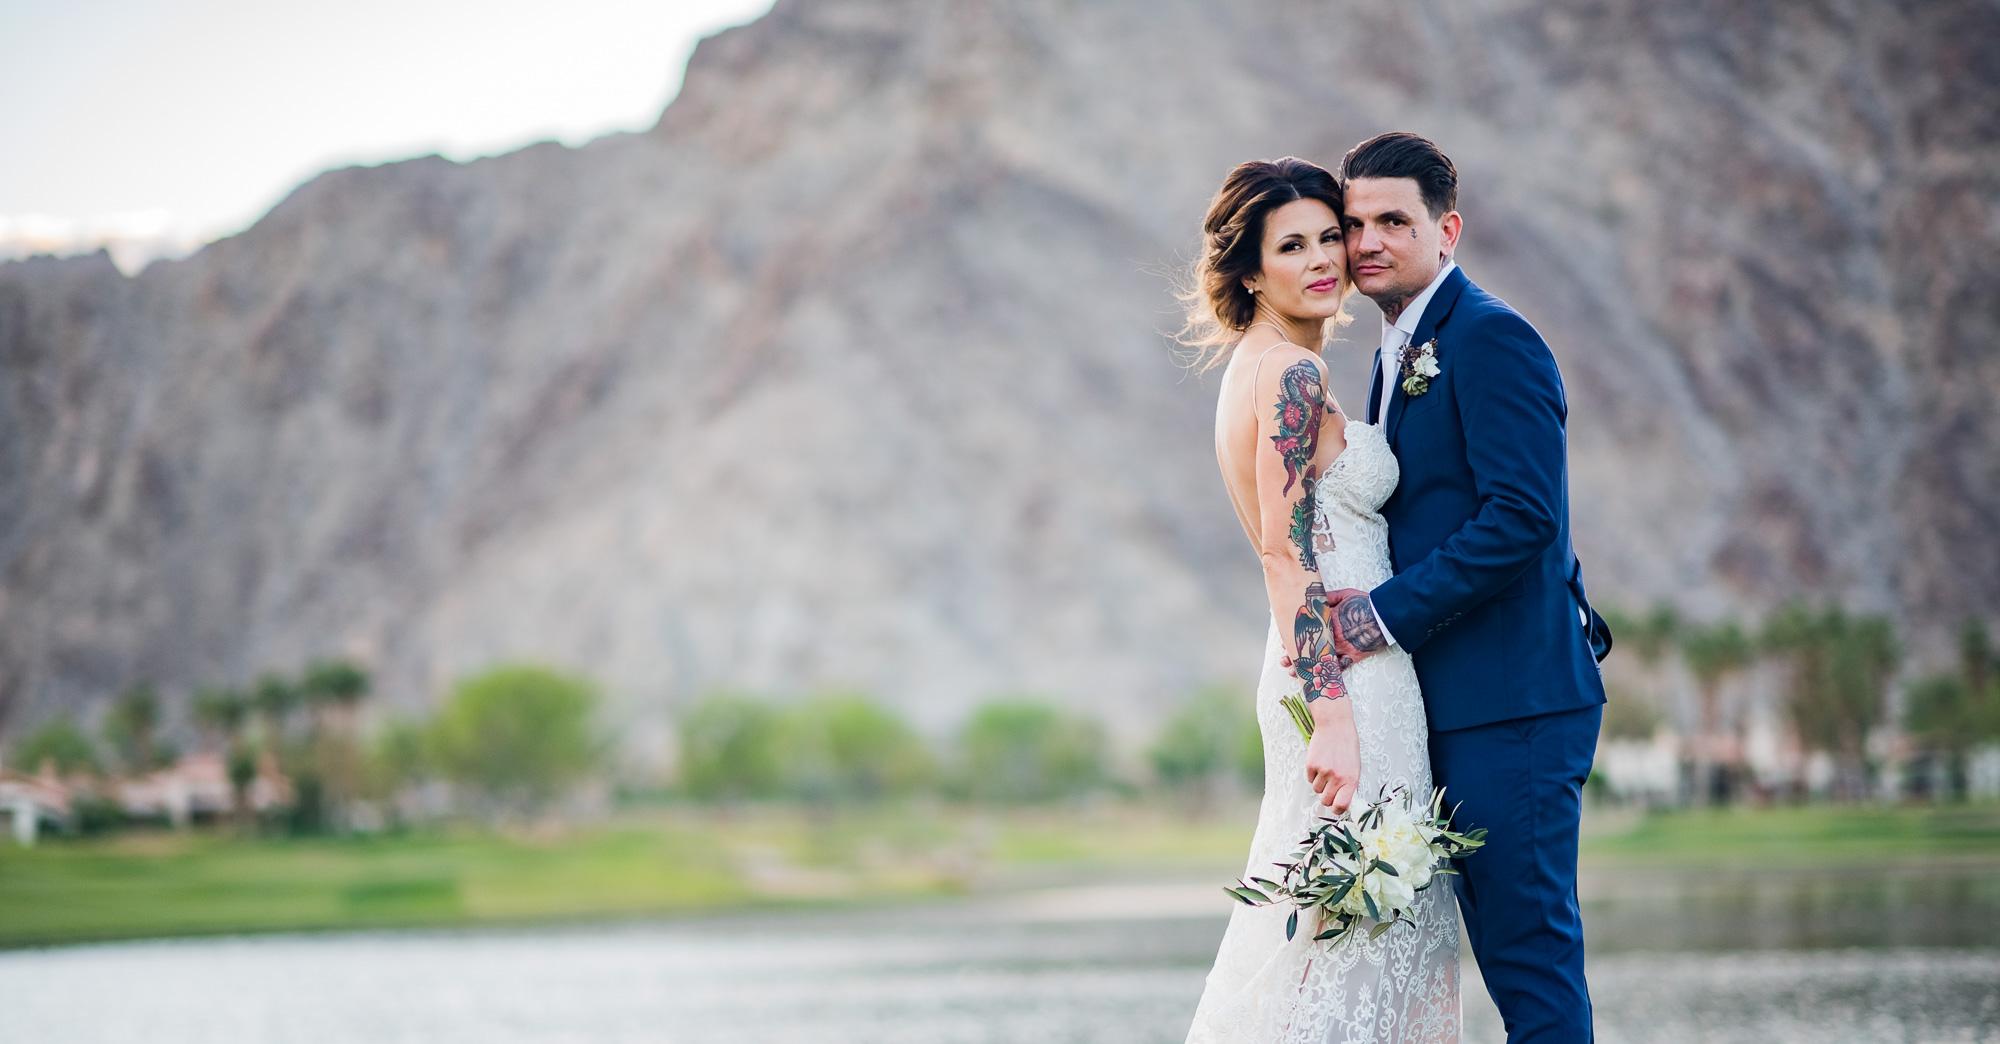 Stephanie & Tony's PGA West Wedding – Palm Springs featured slider image